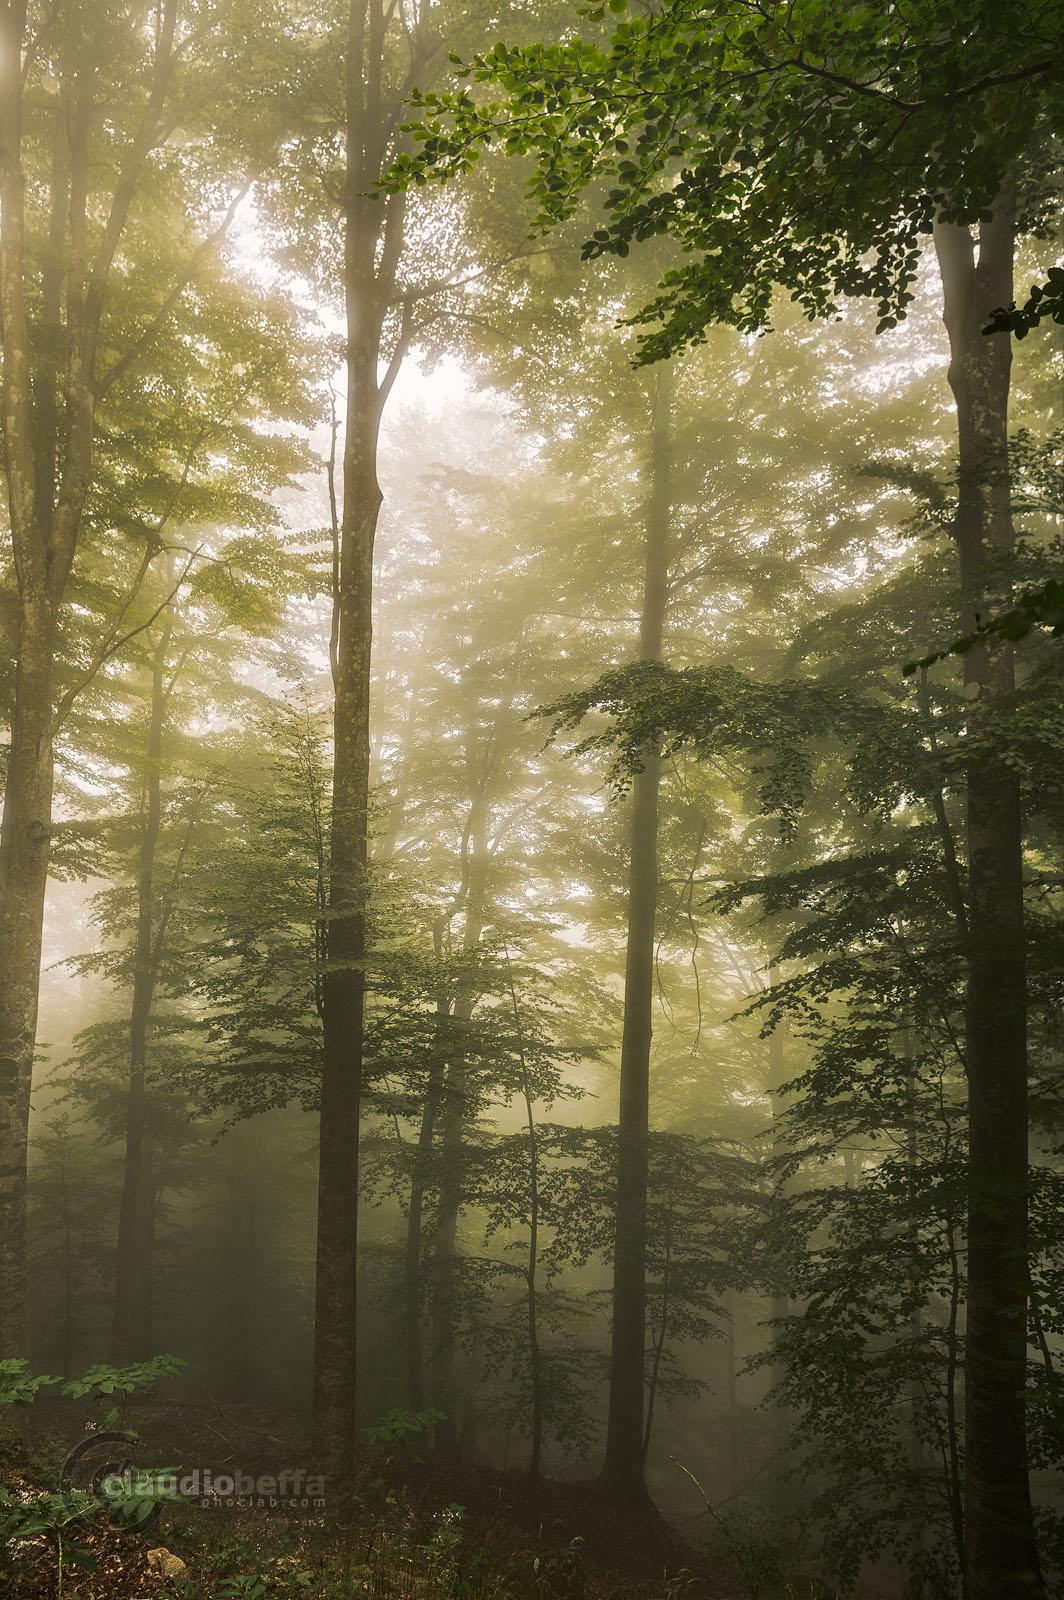 Forest, Mist, Fog, Fairy-tale, Light, Mount Amiata, Italy, Tuscany